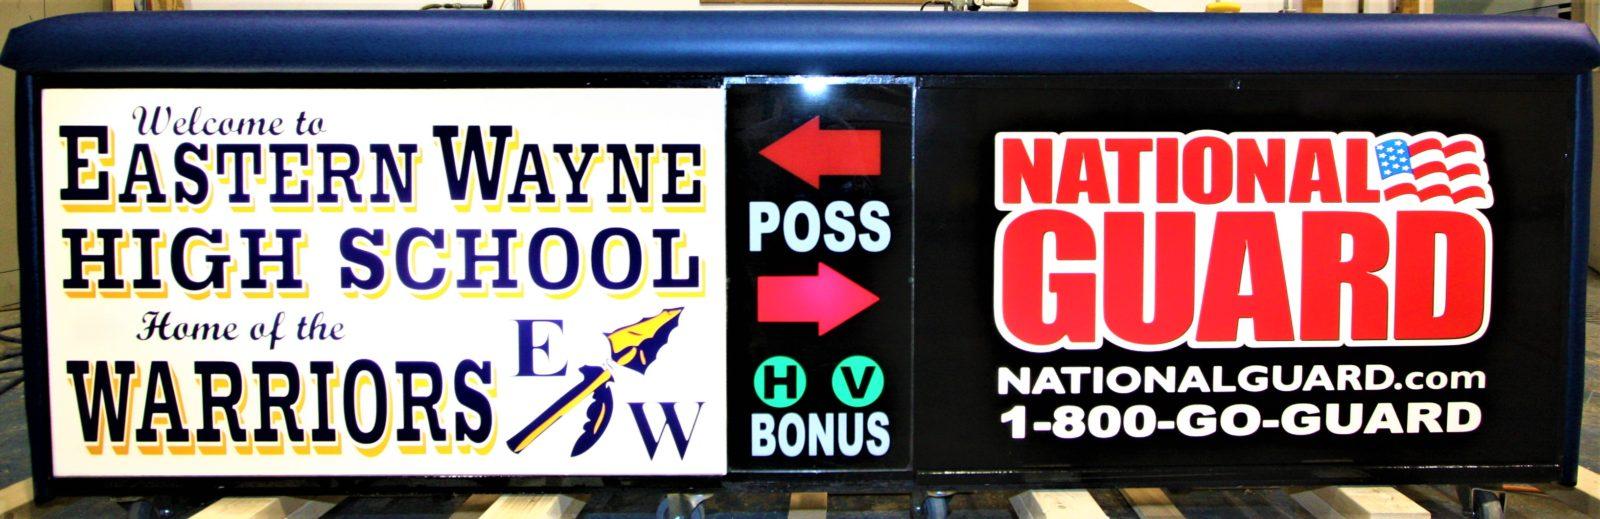 Eastern Wayne High school scoring table North Carolina Army National Guard NCARNG